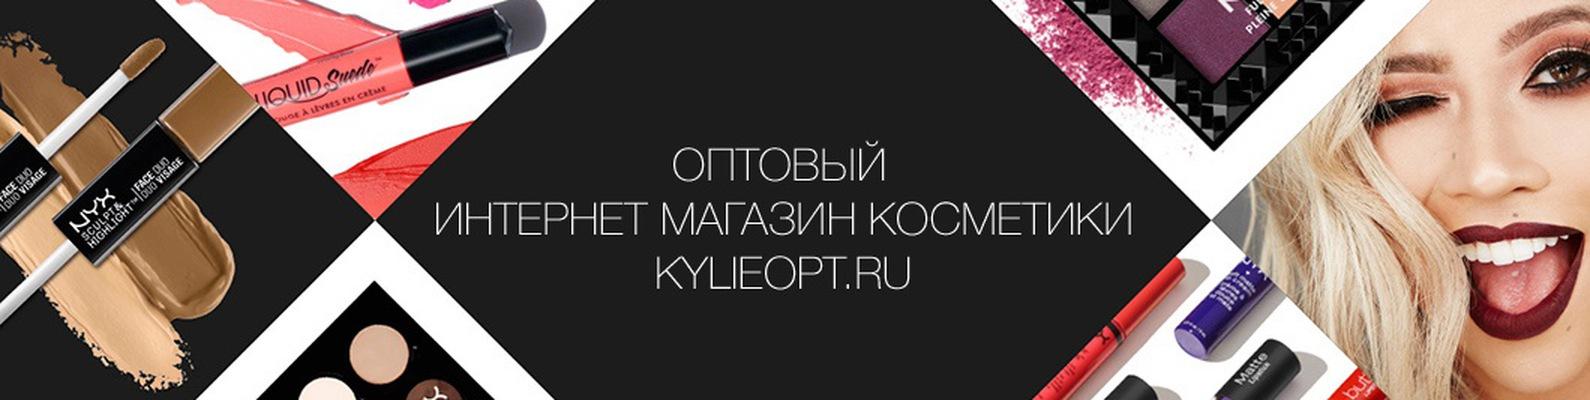 Nyx косметика официальный магазин москва